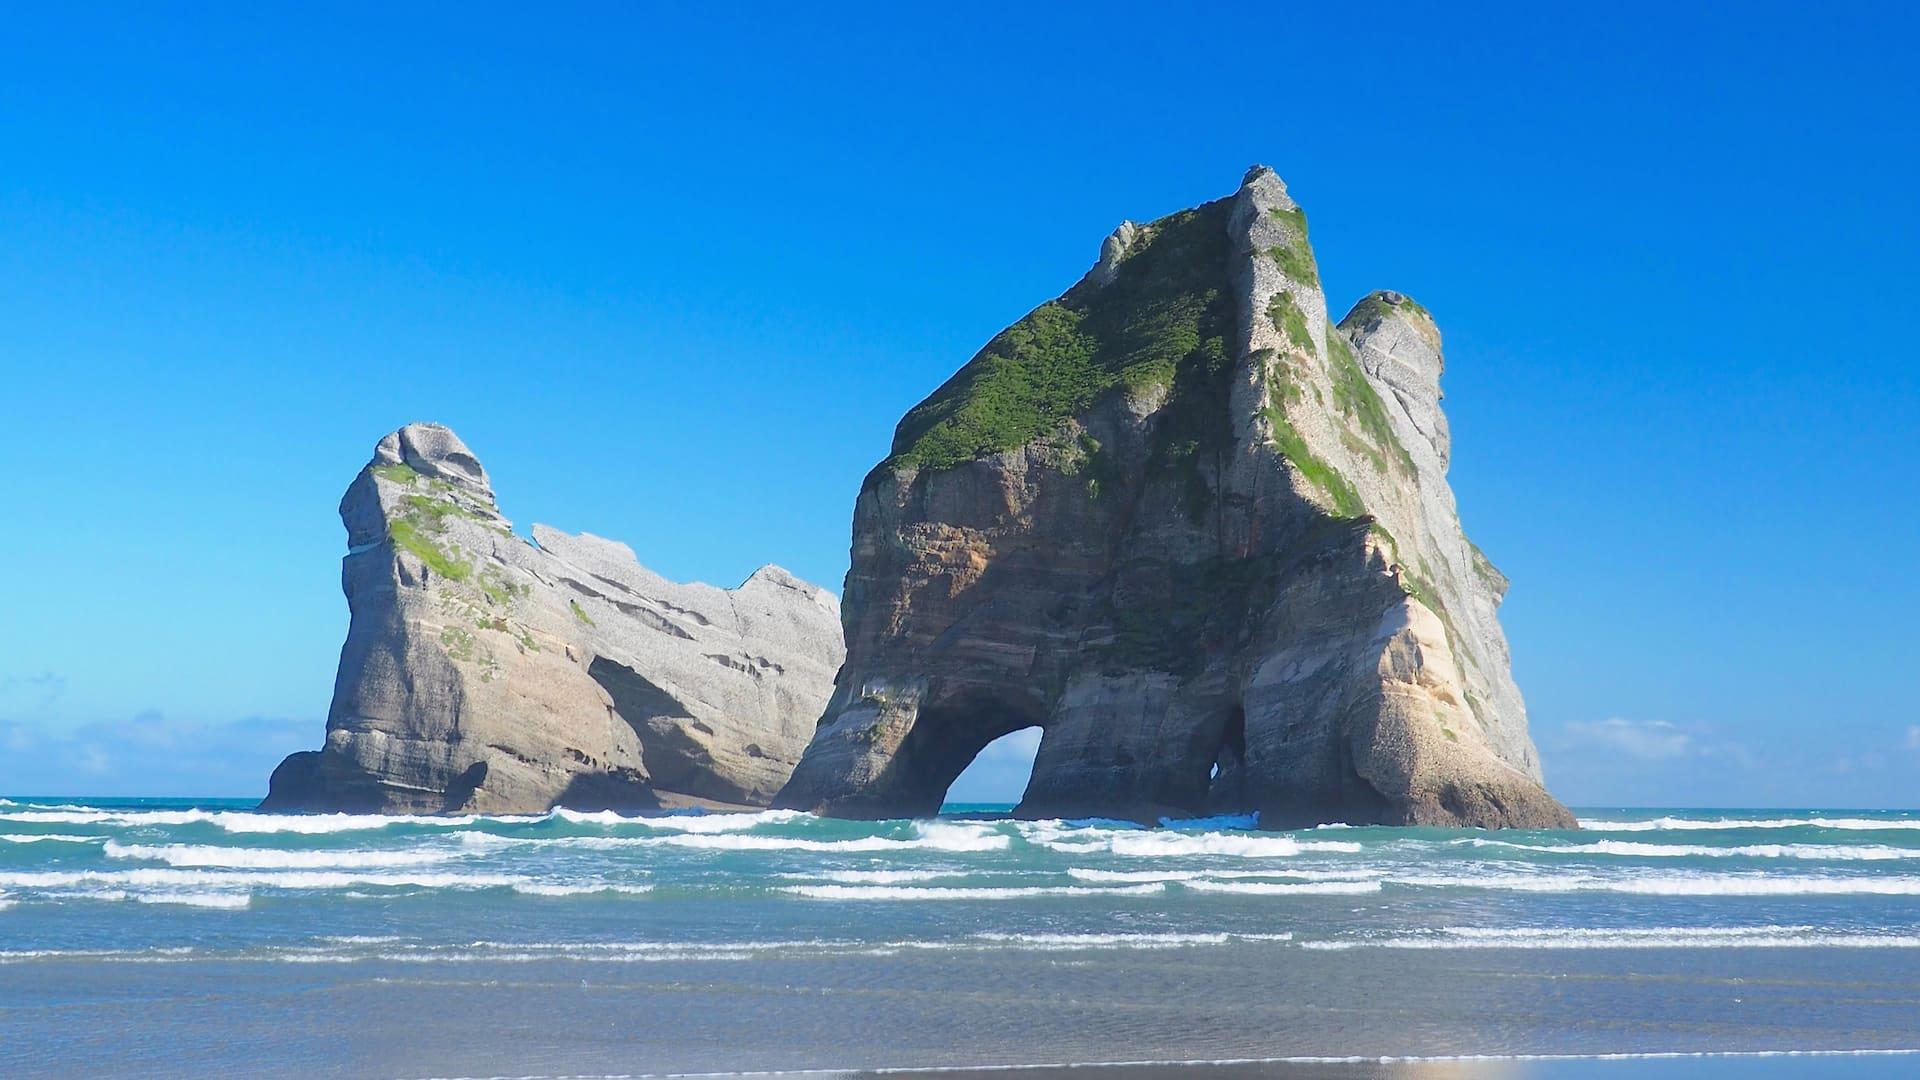 THREE NEW ZEALAND WALKS YOU WON'T WANT TO MISS